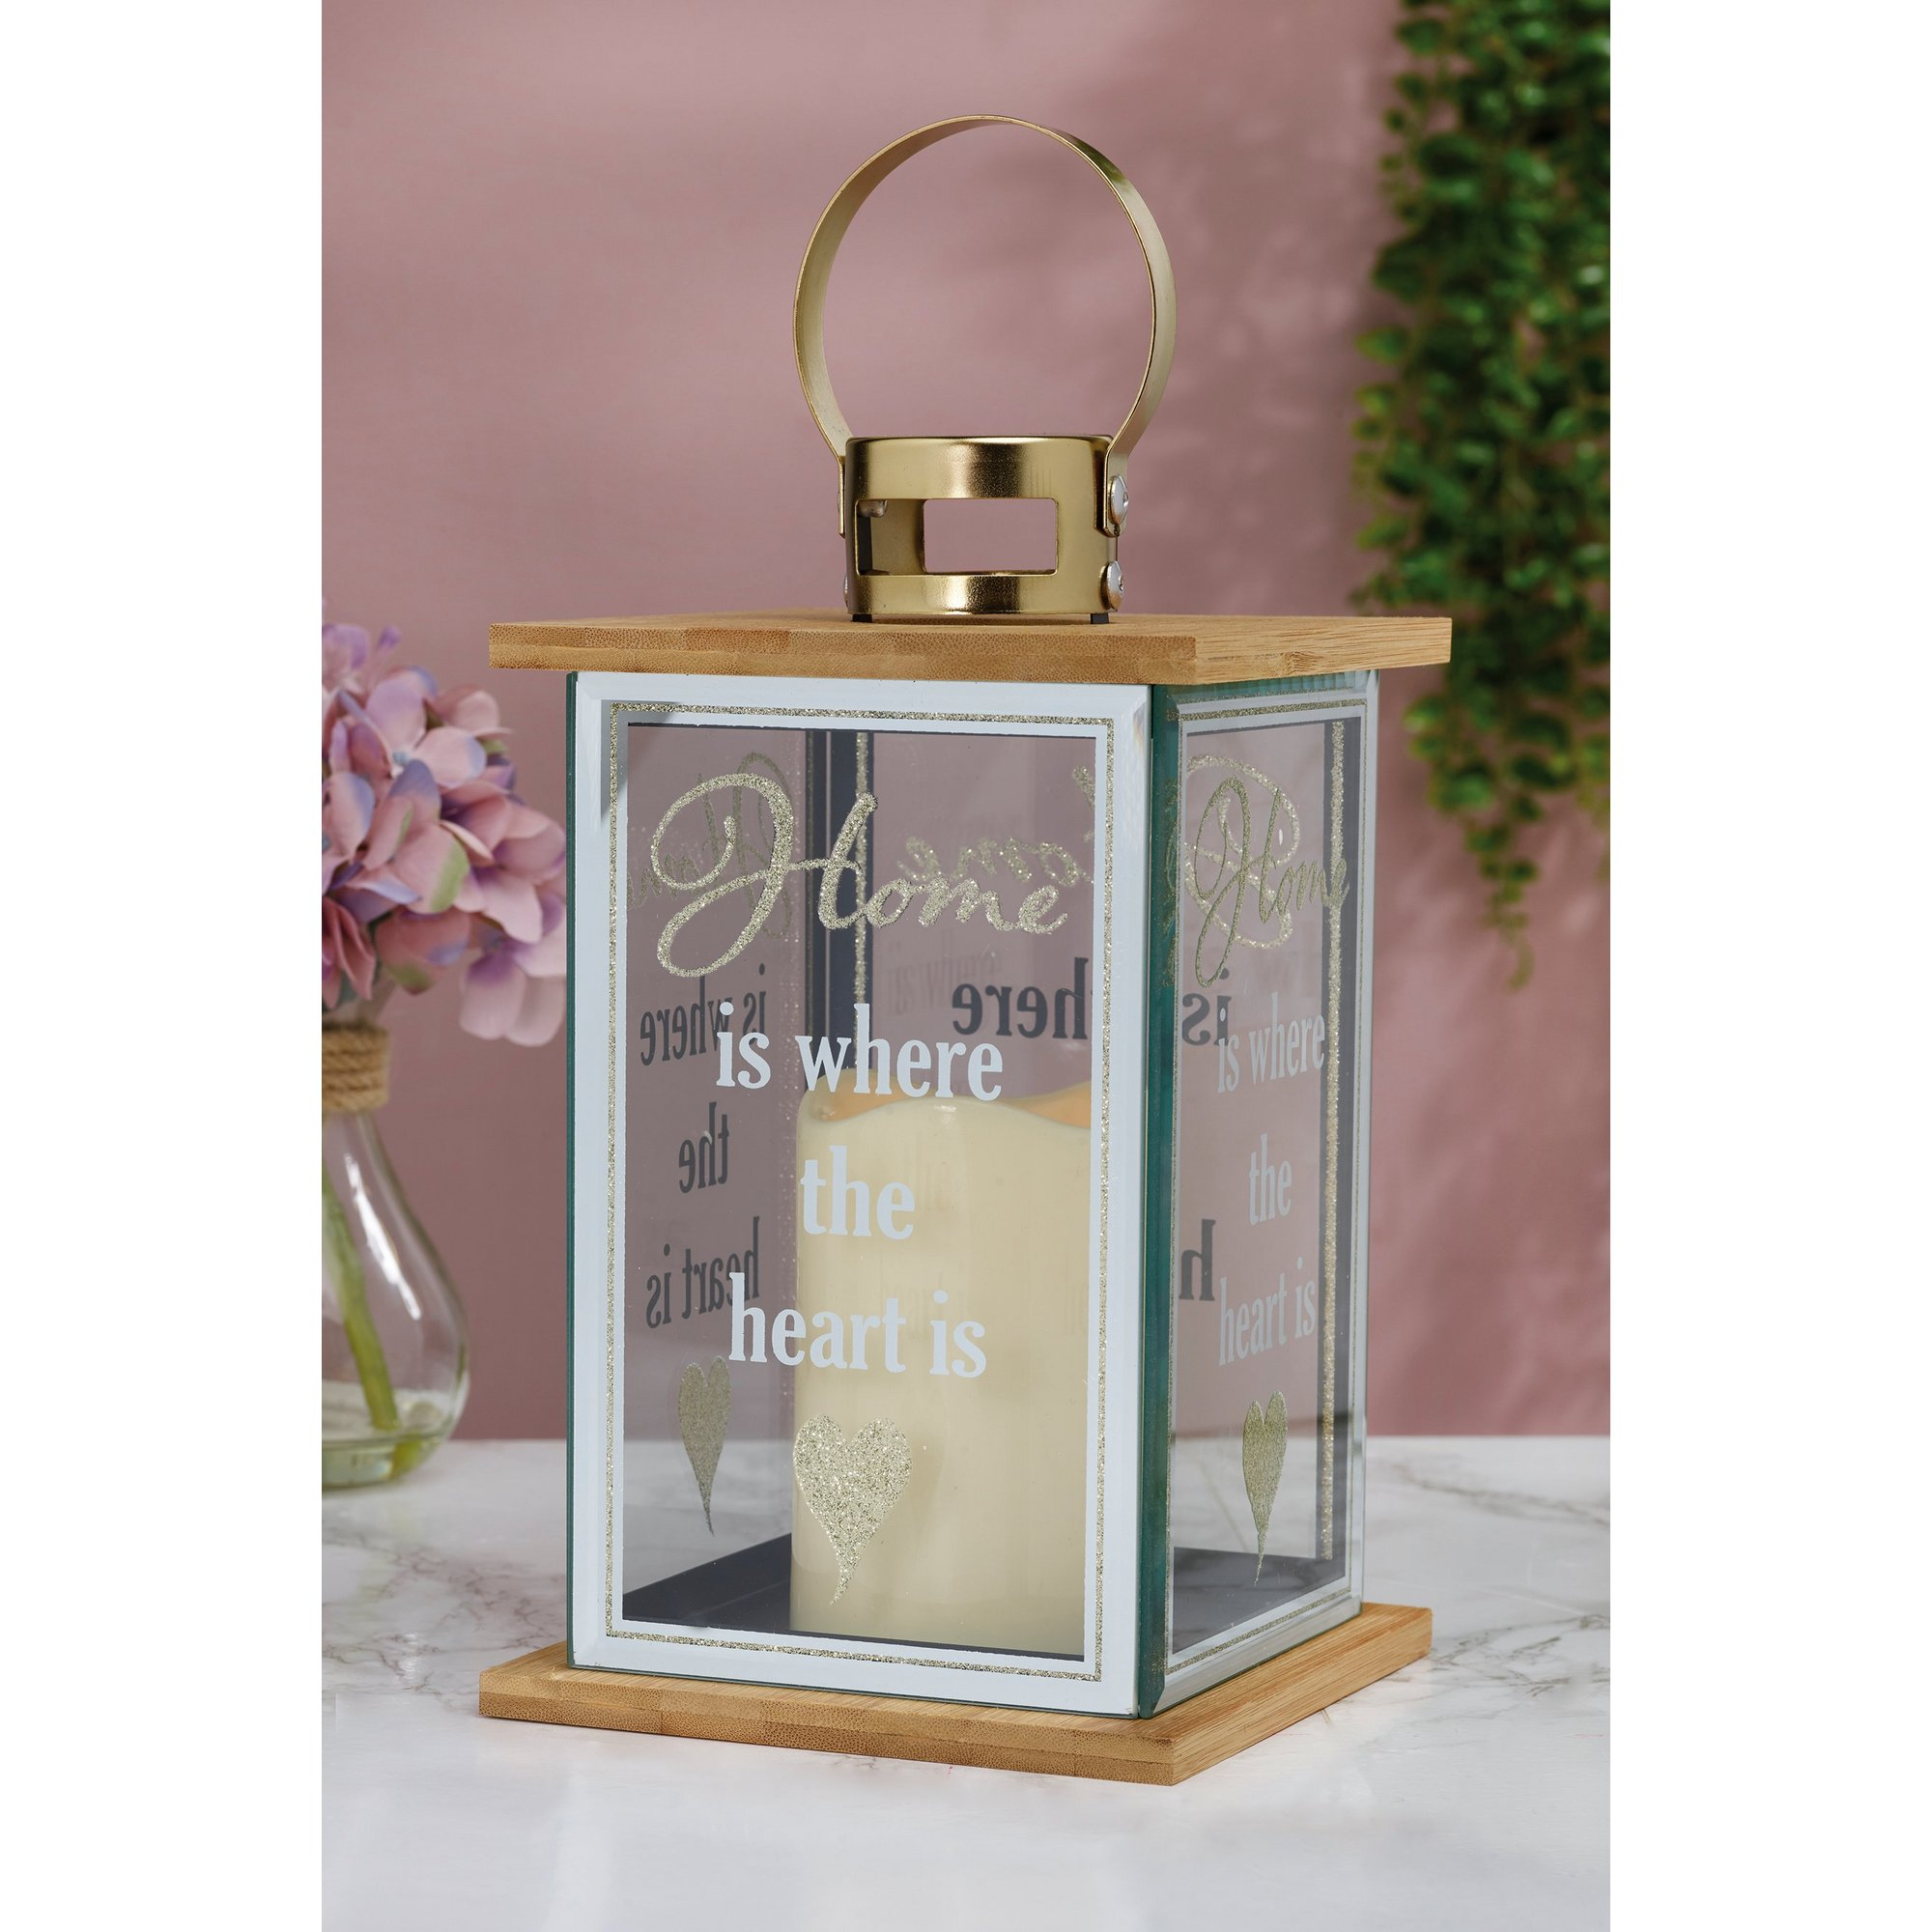 Image of LED Home Glass Lantern